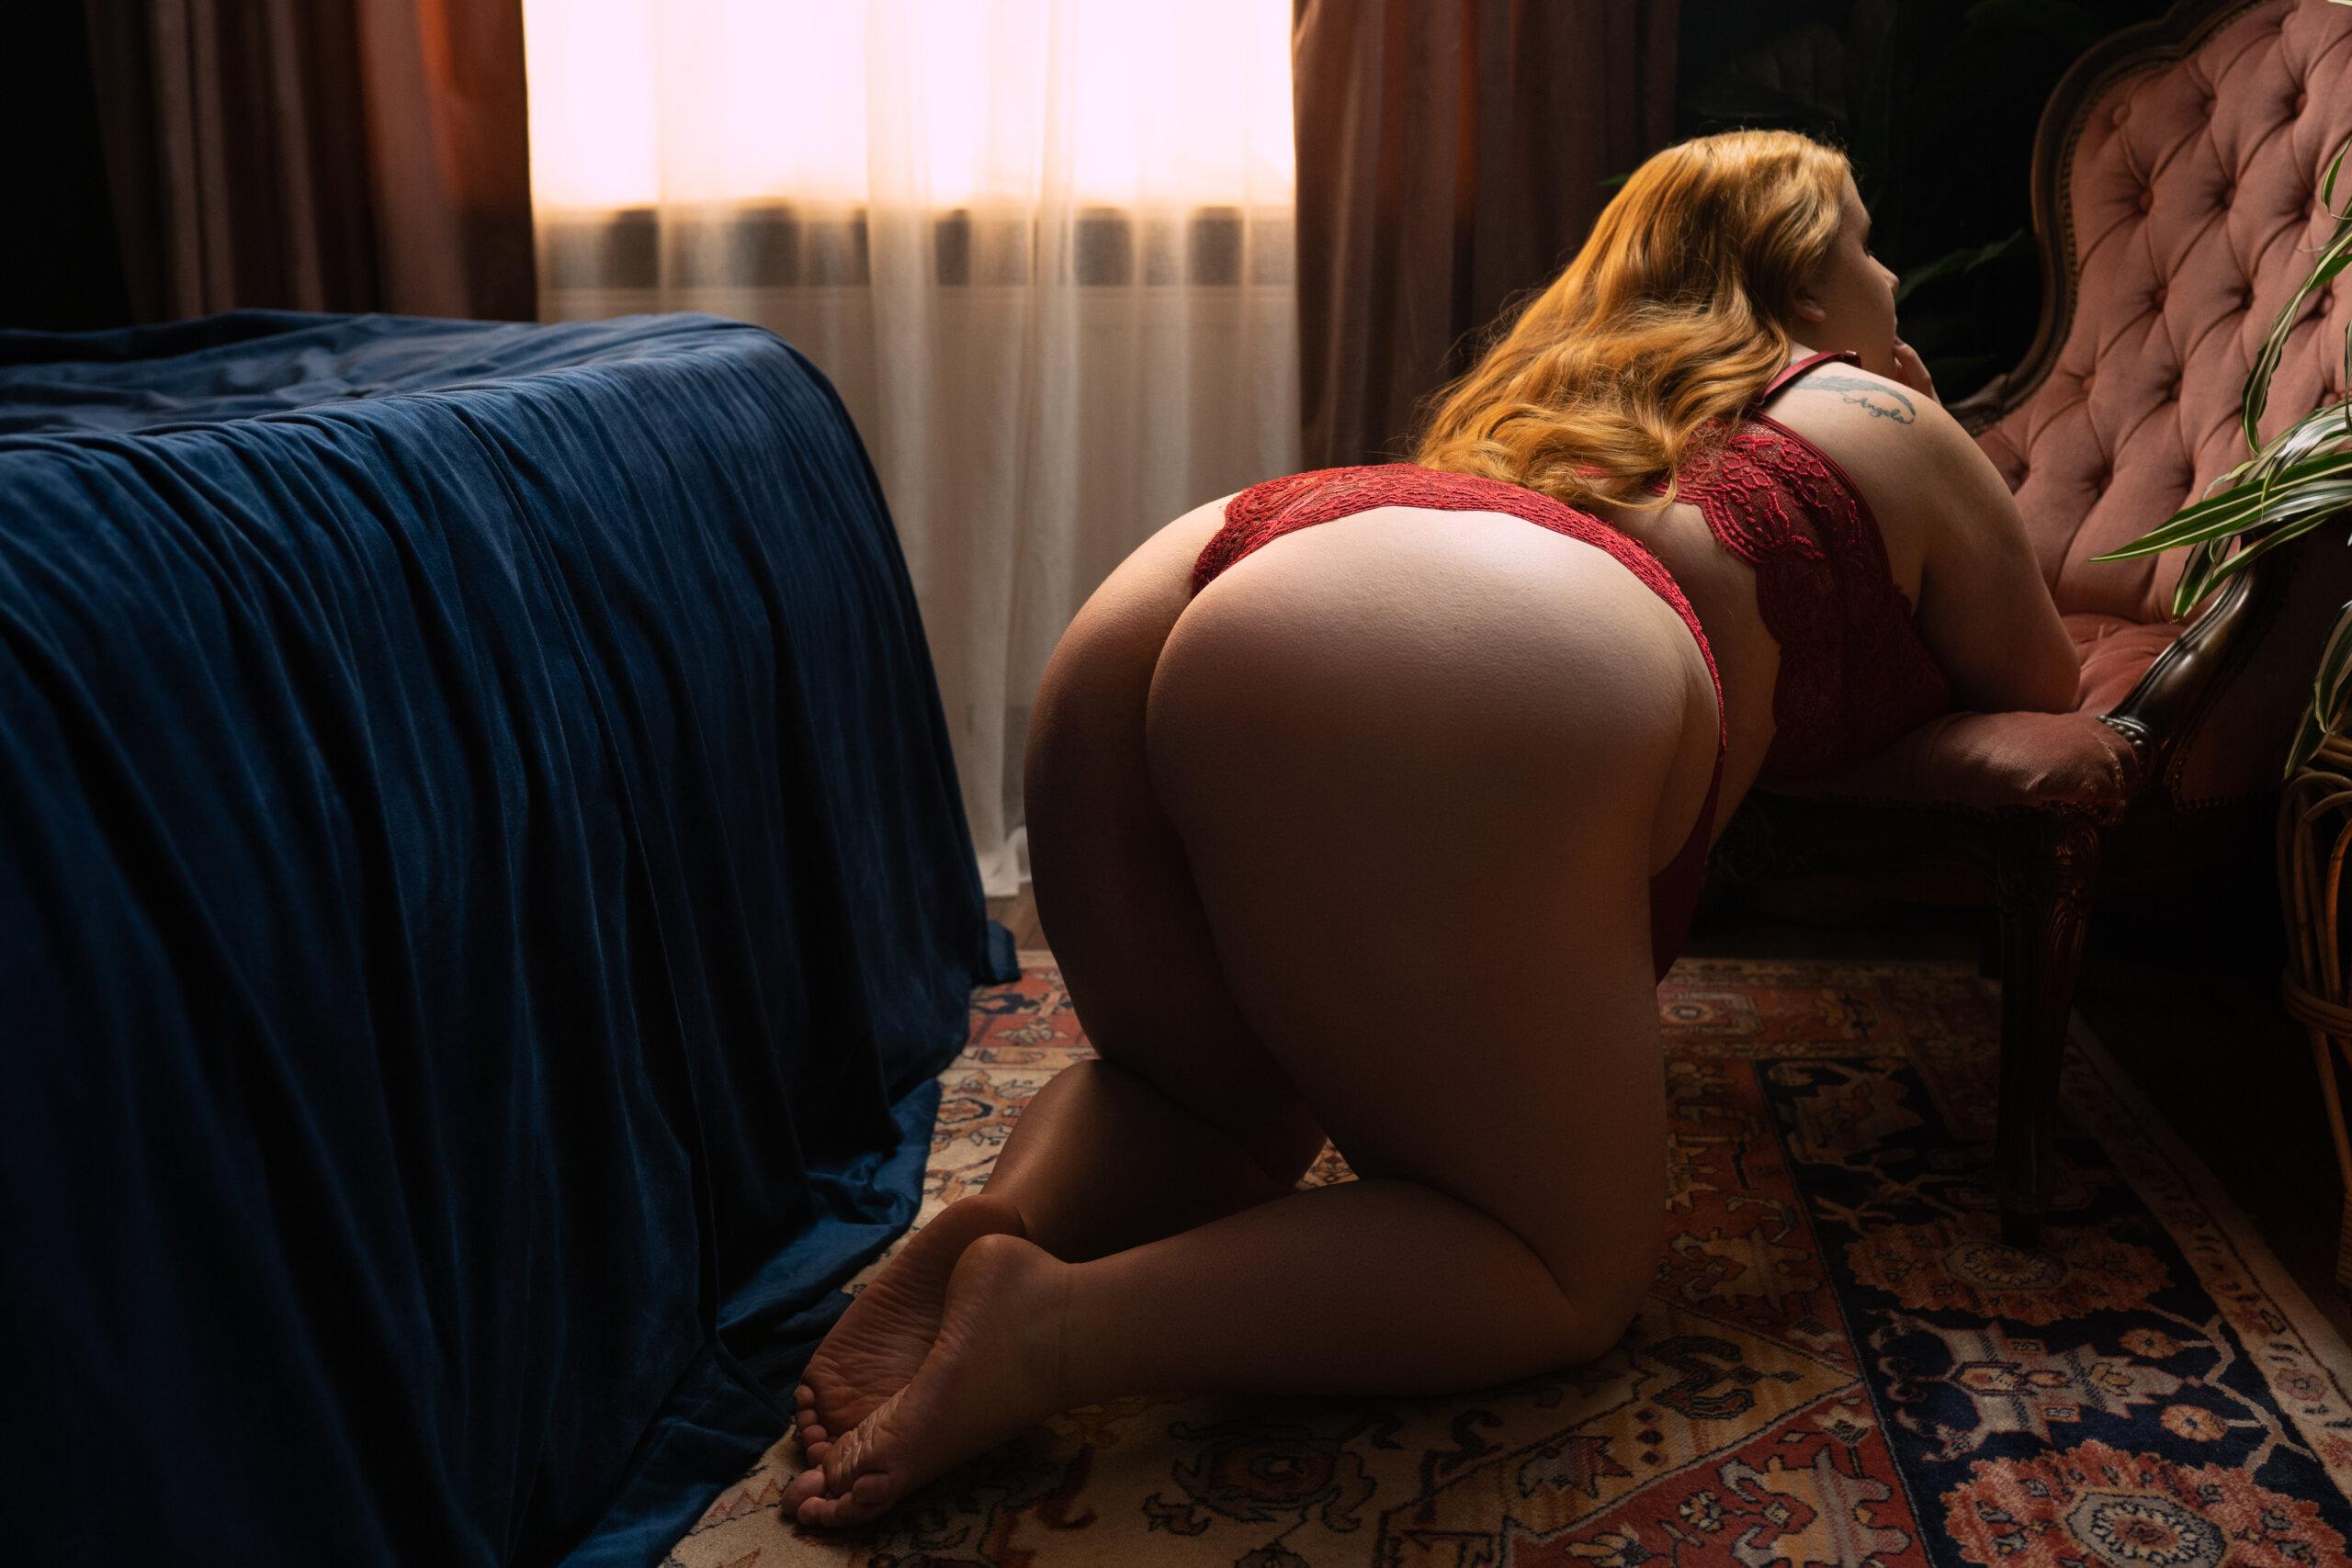 Vrouw in lingerie die op stoel poseert